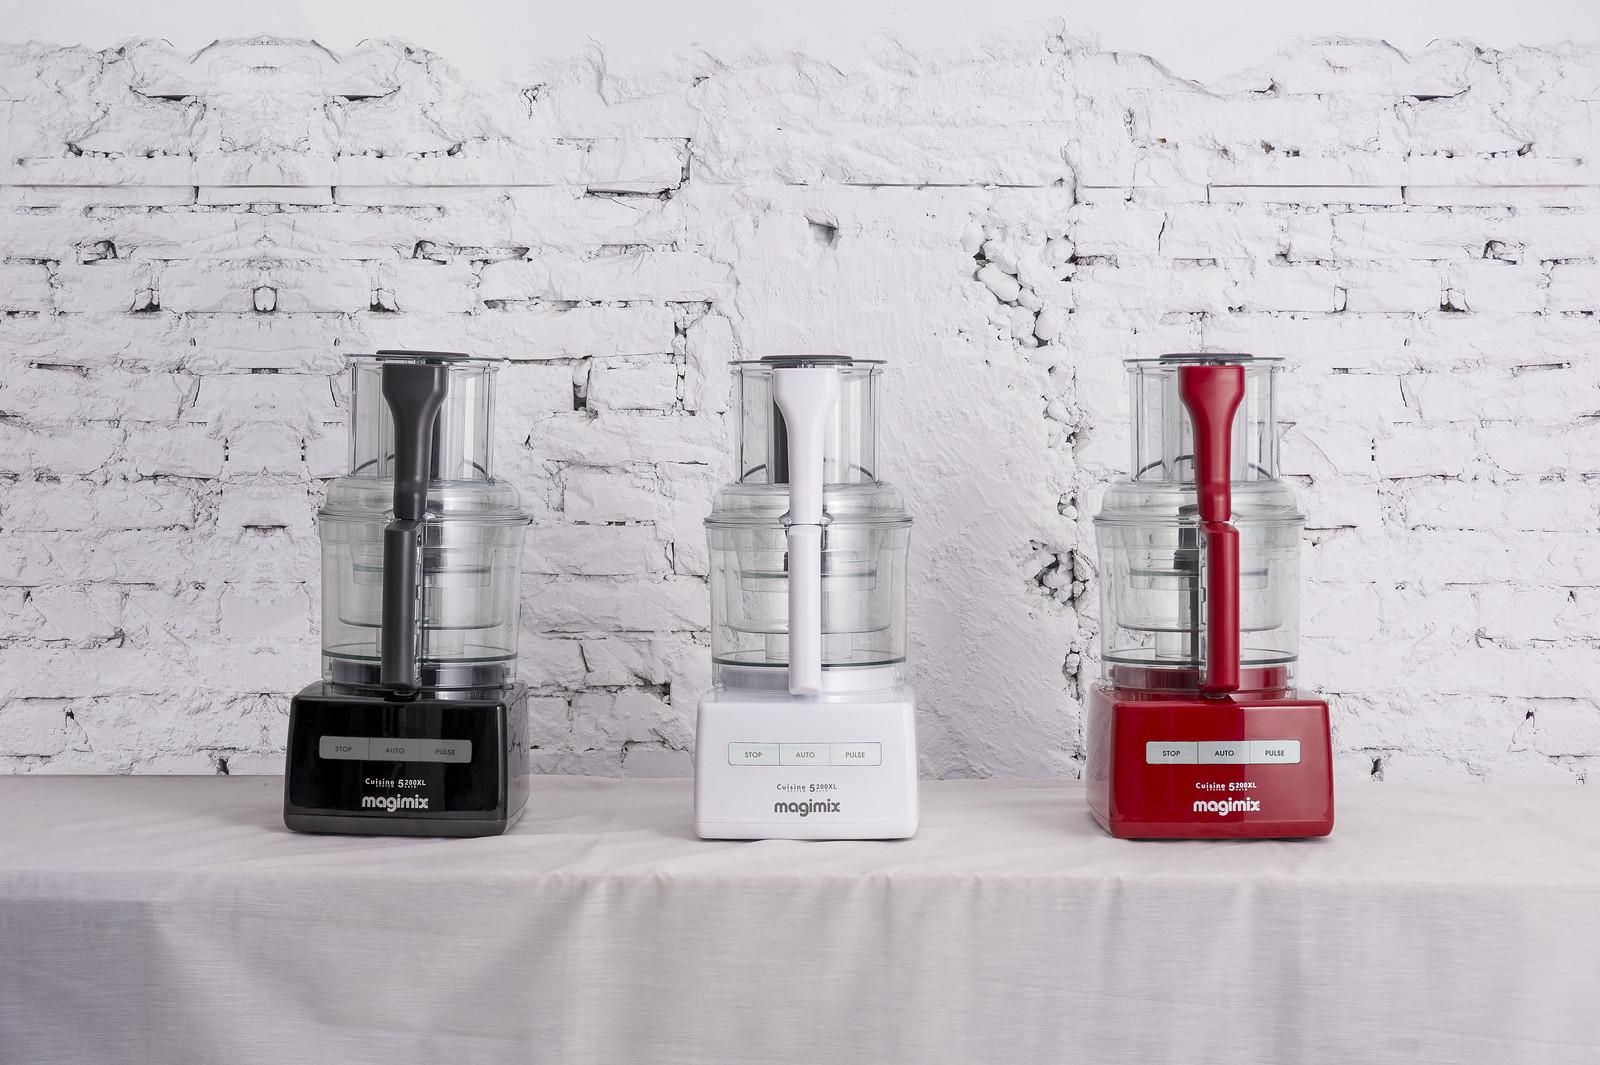 【magimix】magimix食物處理機共推出兩款機型,皆有黑白紅三色可選